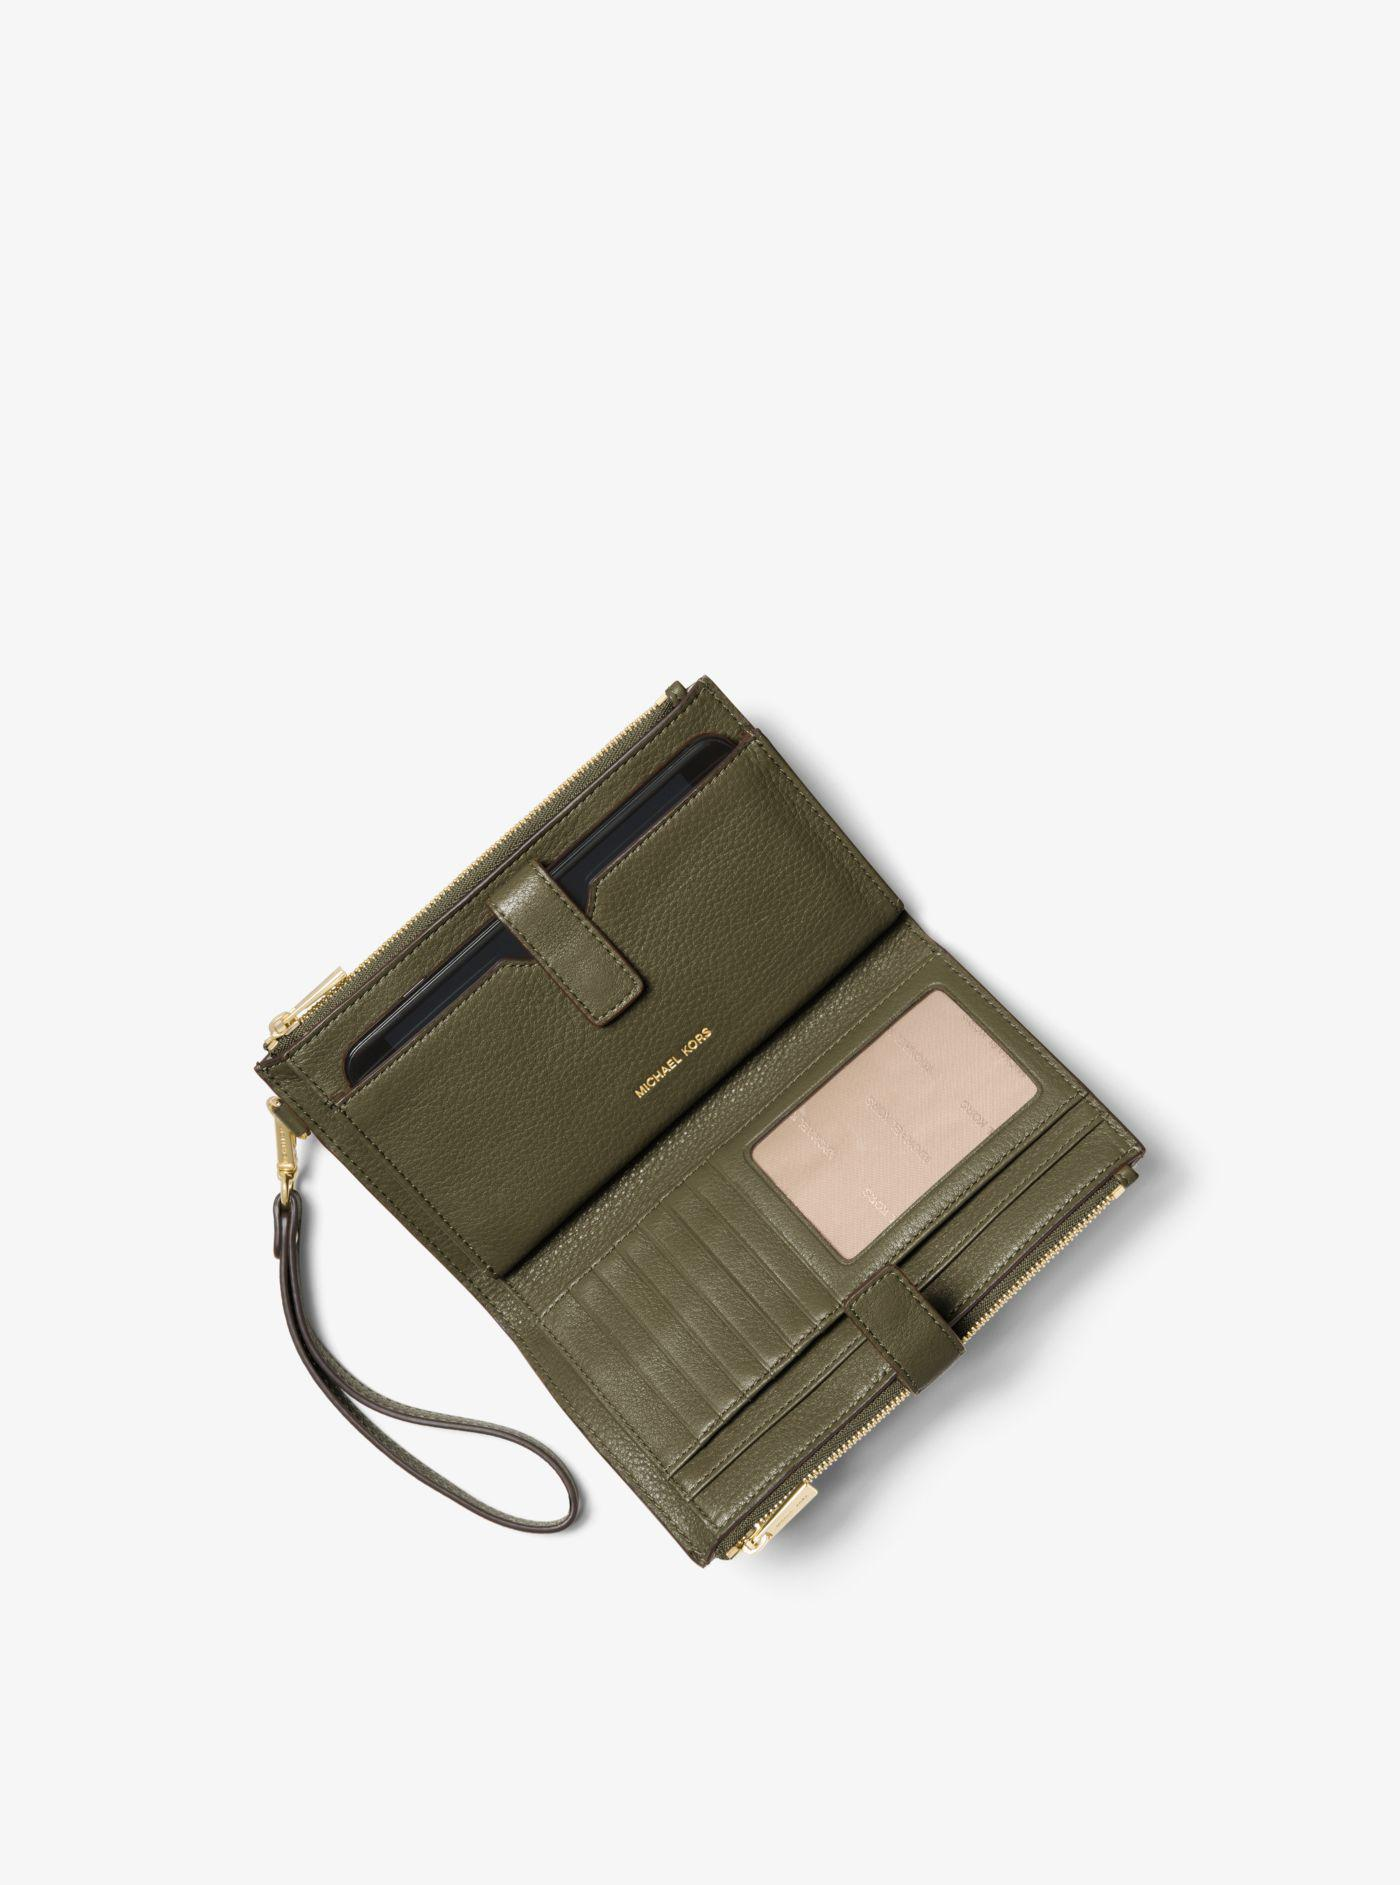 ea1cdc58ebf6 Michael Kors - Green Adele Leather Smartphone Wallet - Lyst. View fullscreen